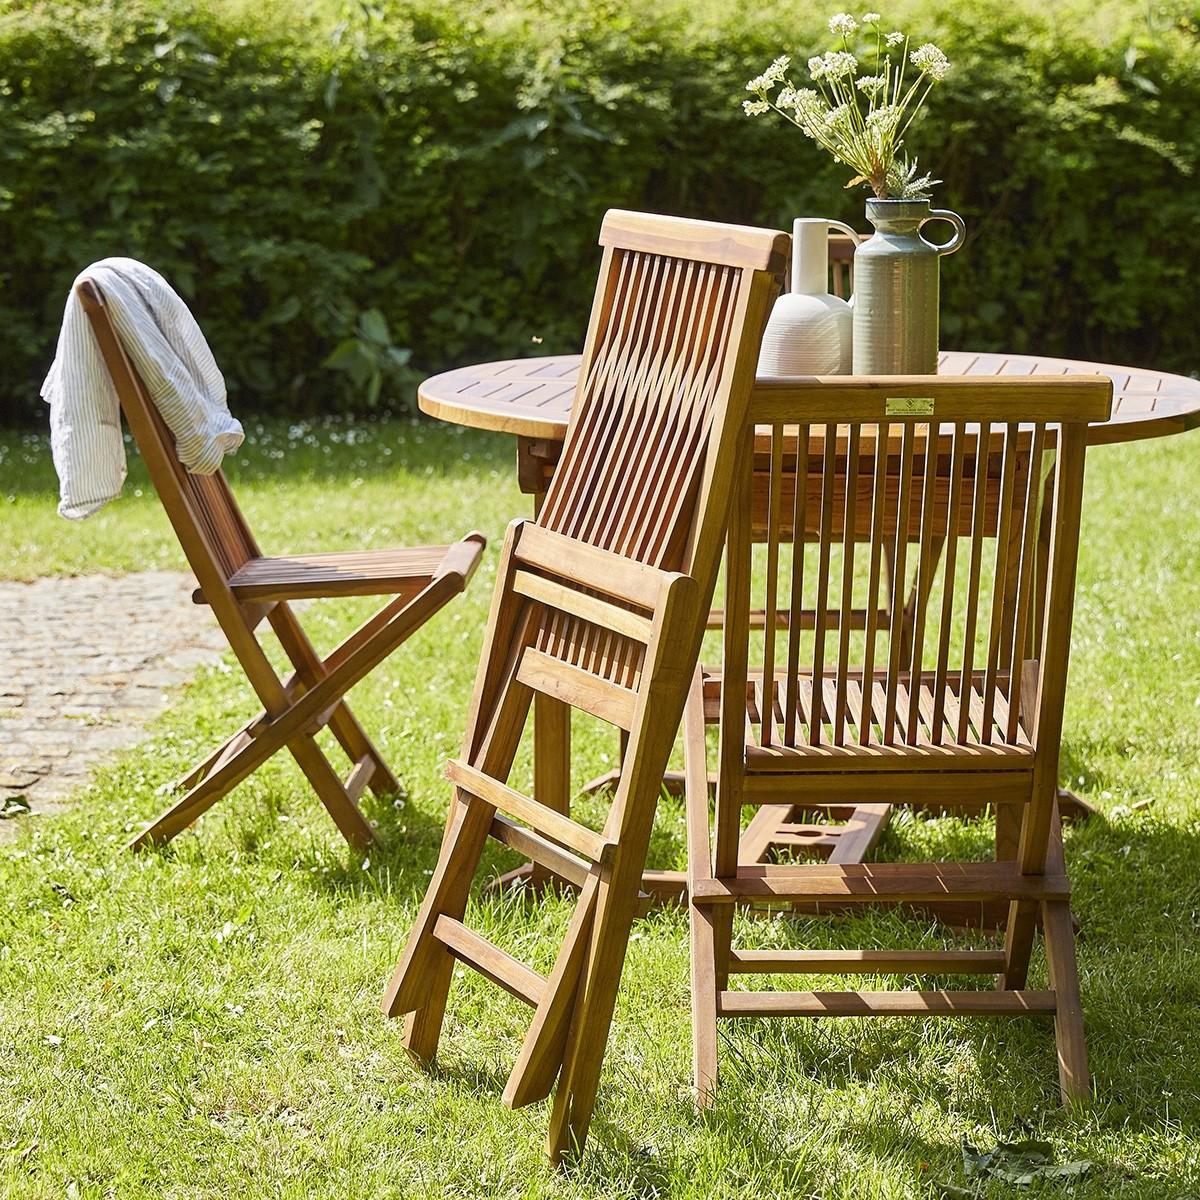 Salon de jardin en bois de teck huil bali 6 8 places bois dessus bois dessous - Salon de jardin teck huile ...